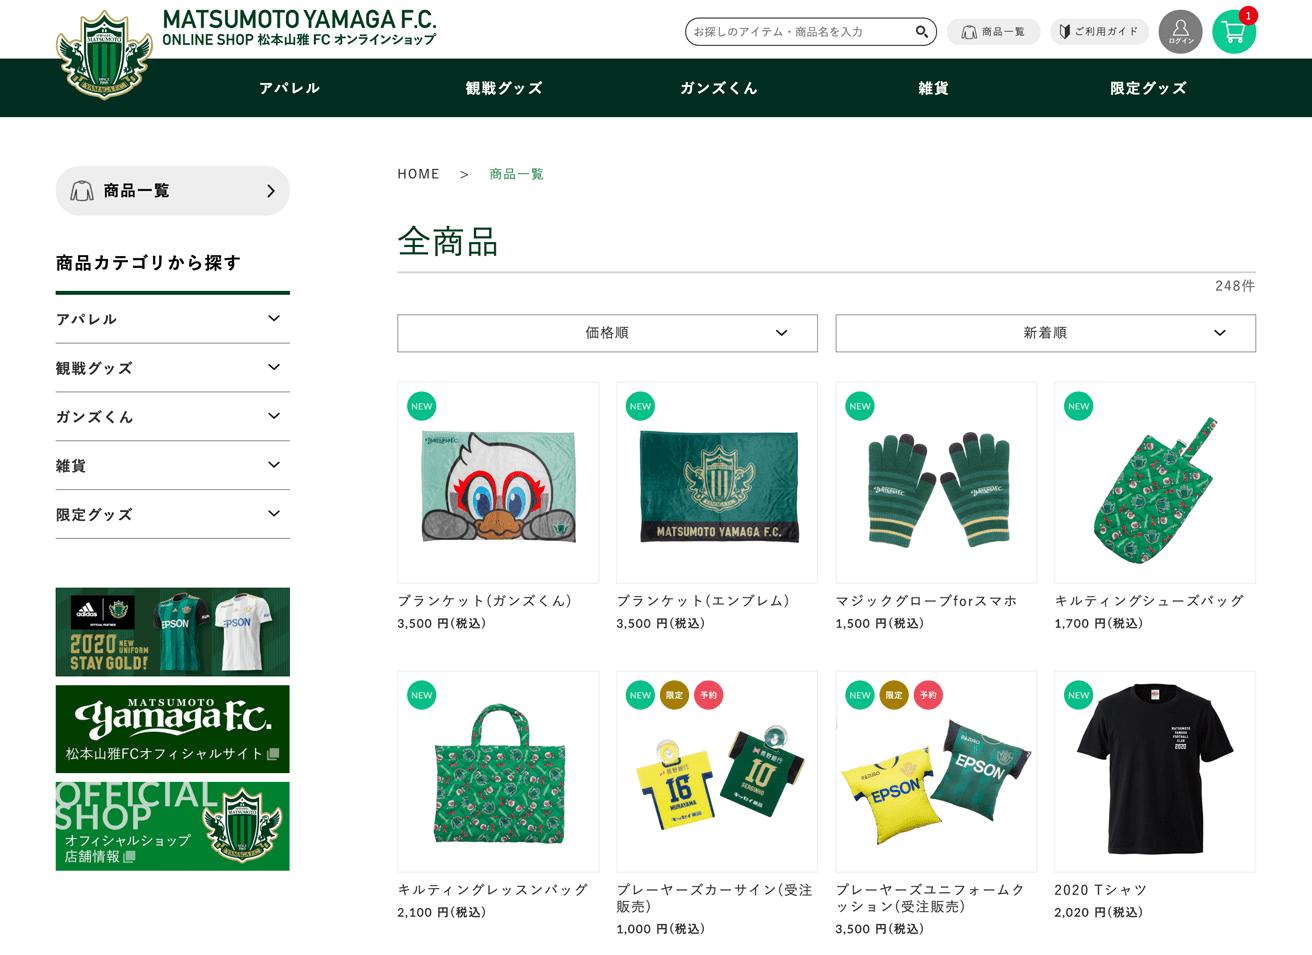 松本山雅FC 商品一覧ページ